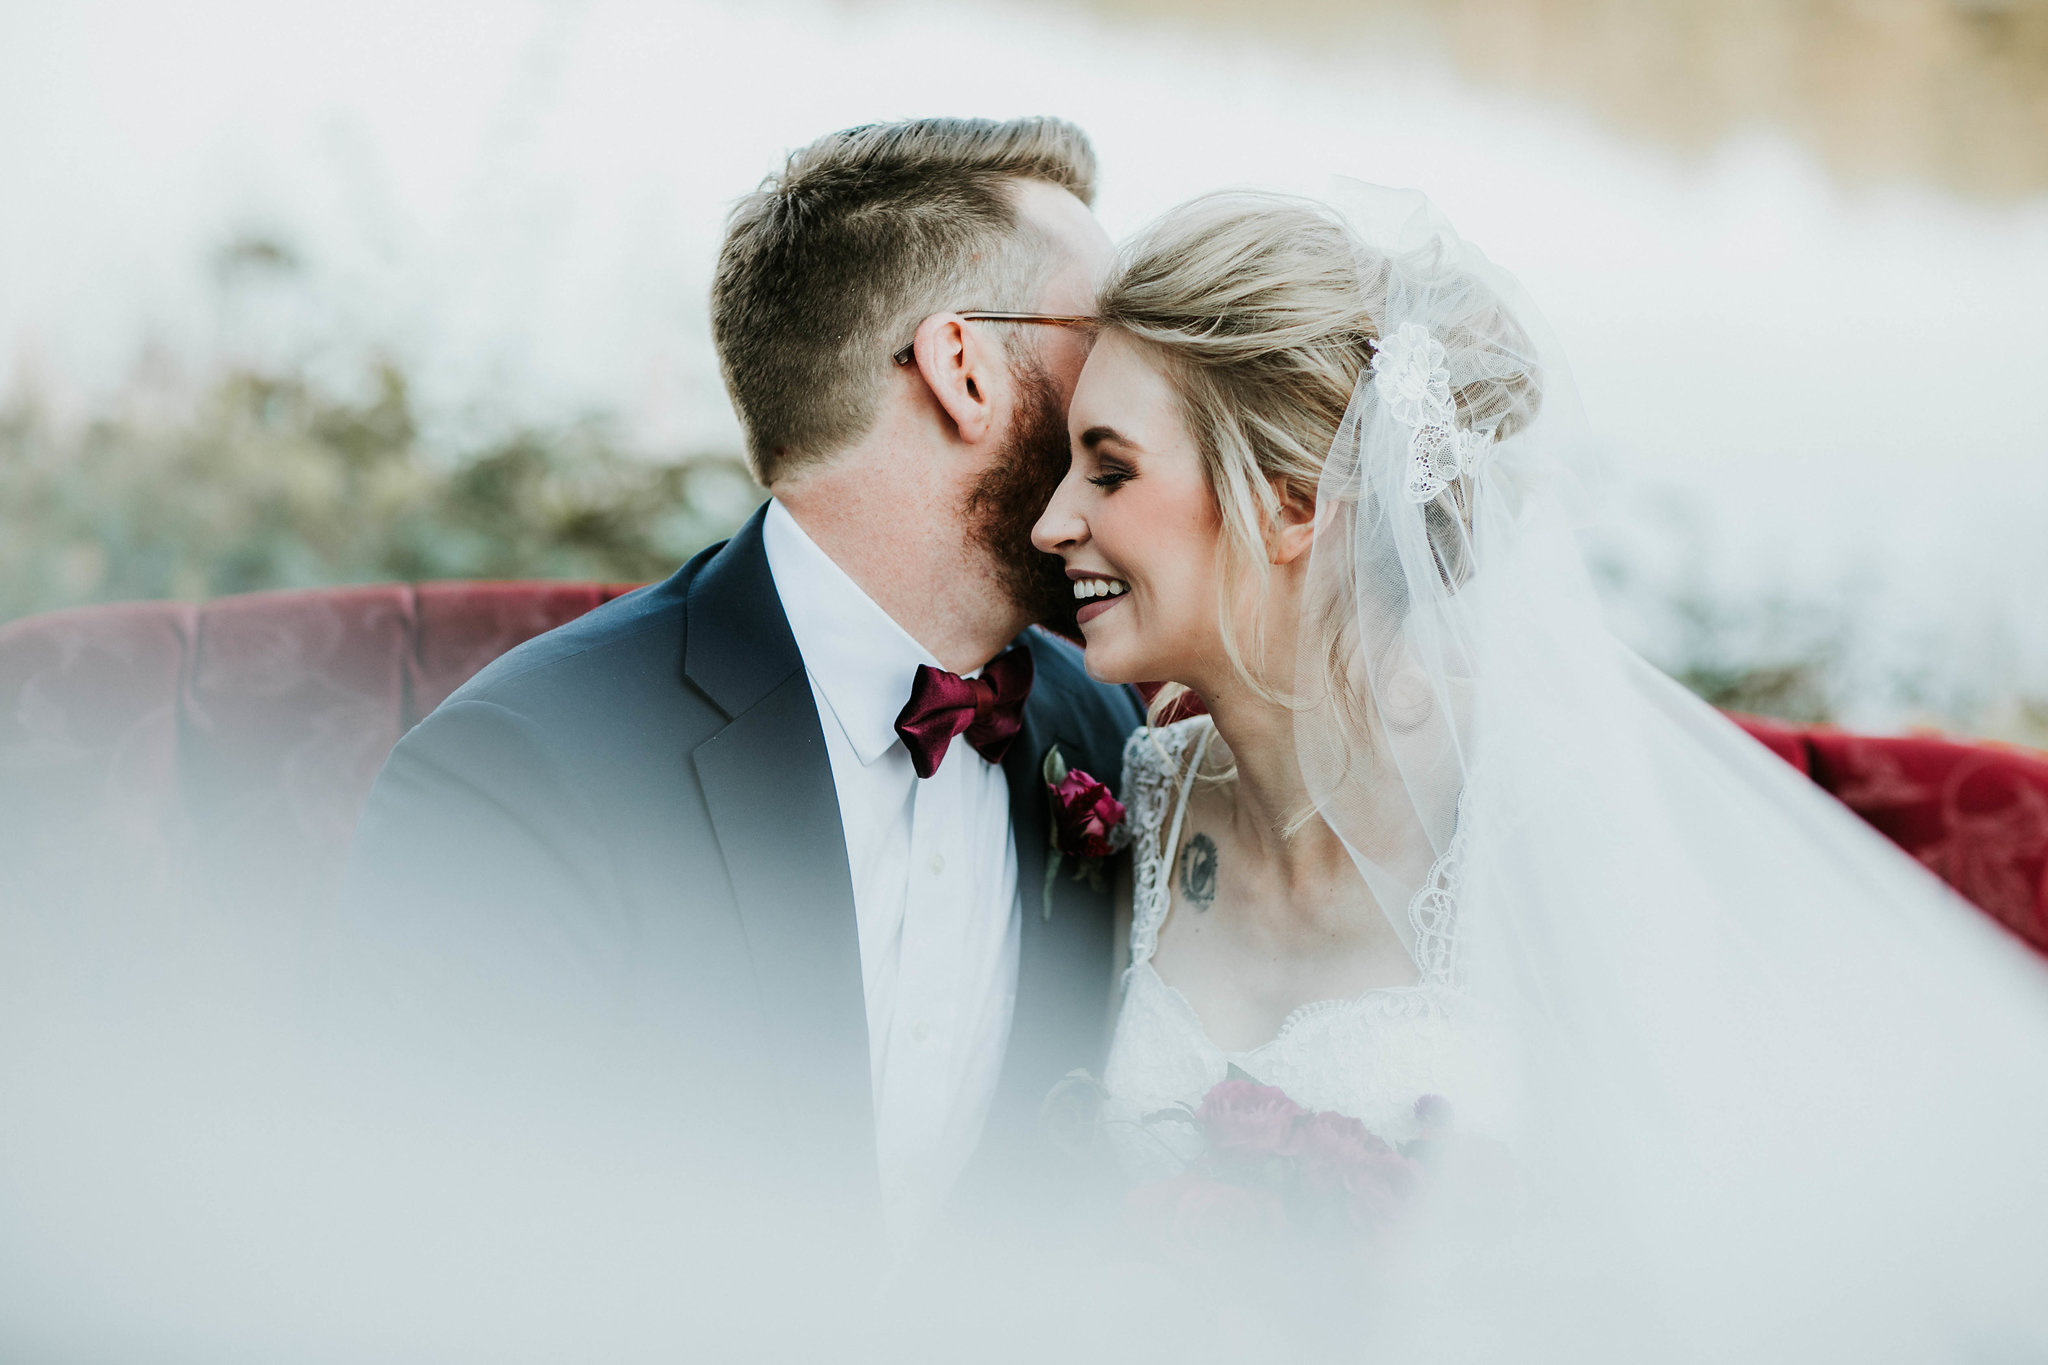 Crystal_Lake_lodge_Wedding_photos_by_Adina_Preston_Weddings_135.JPG